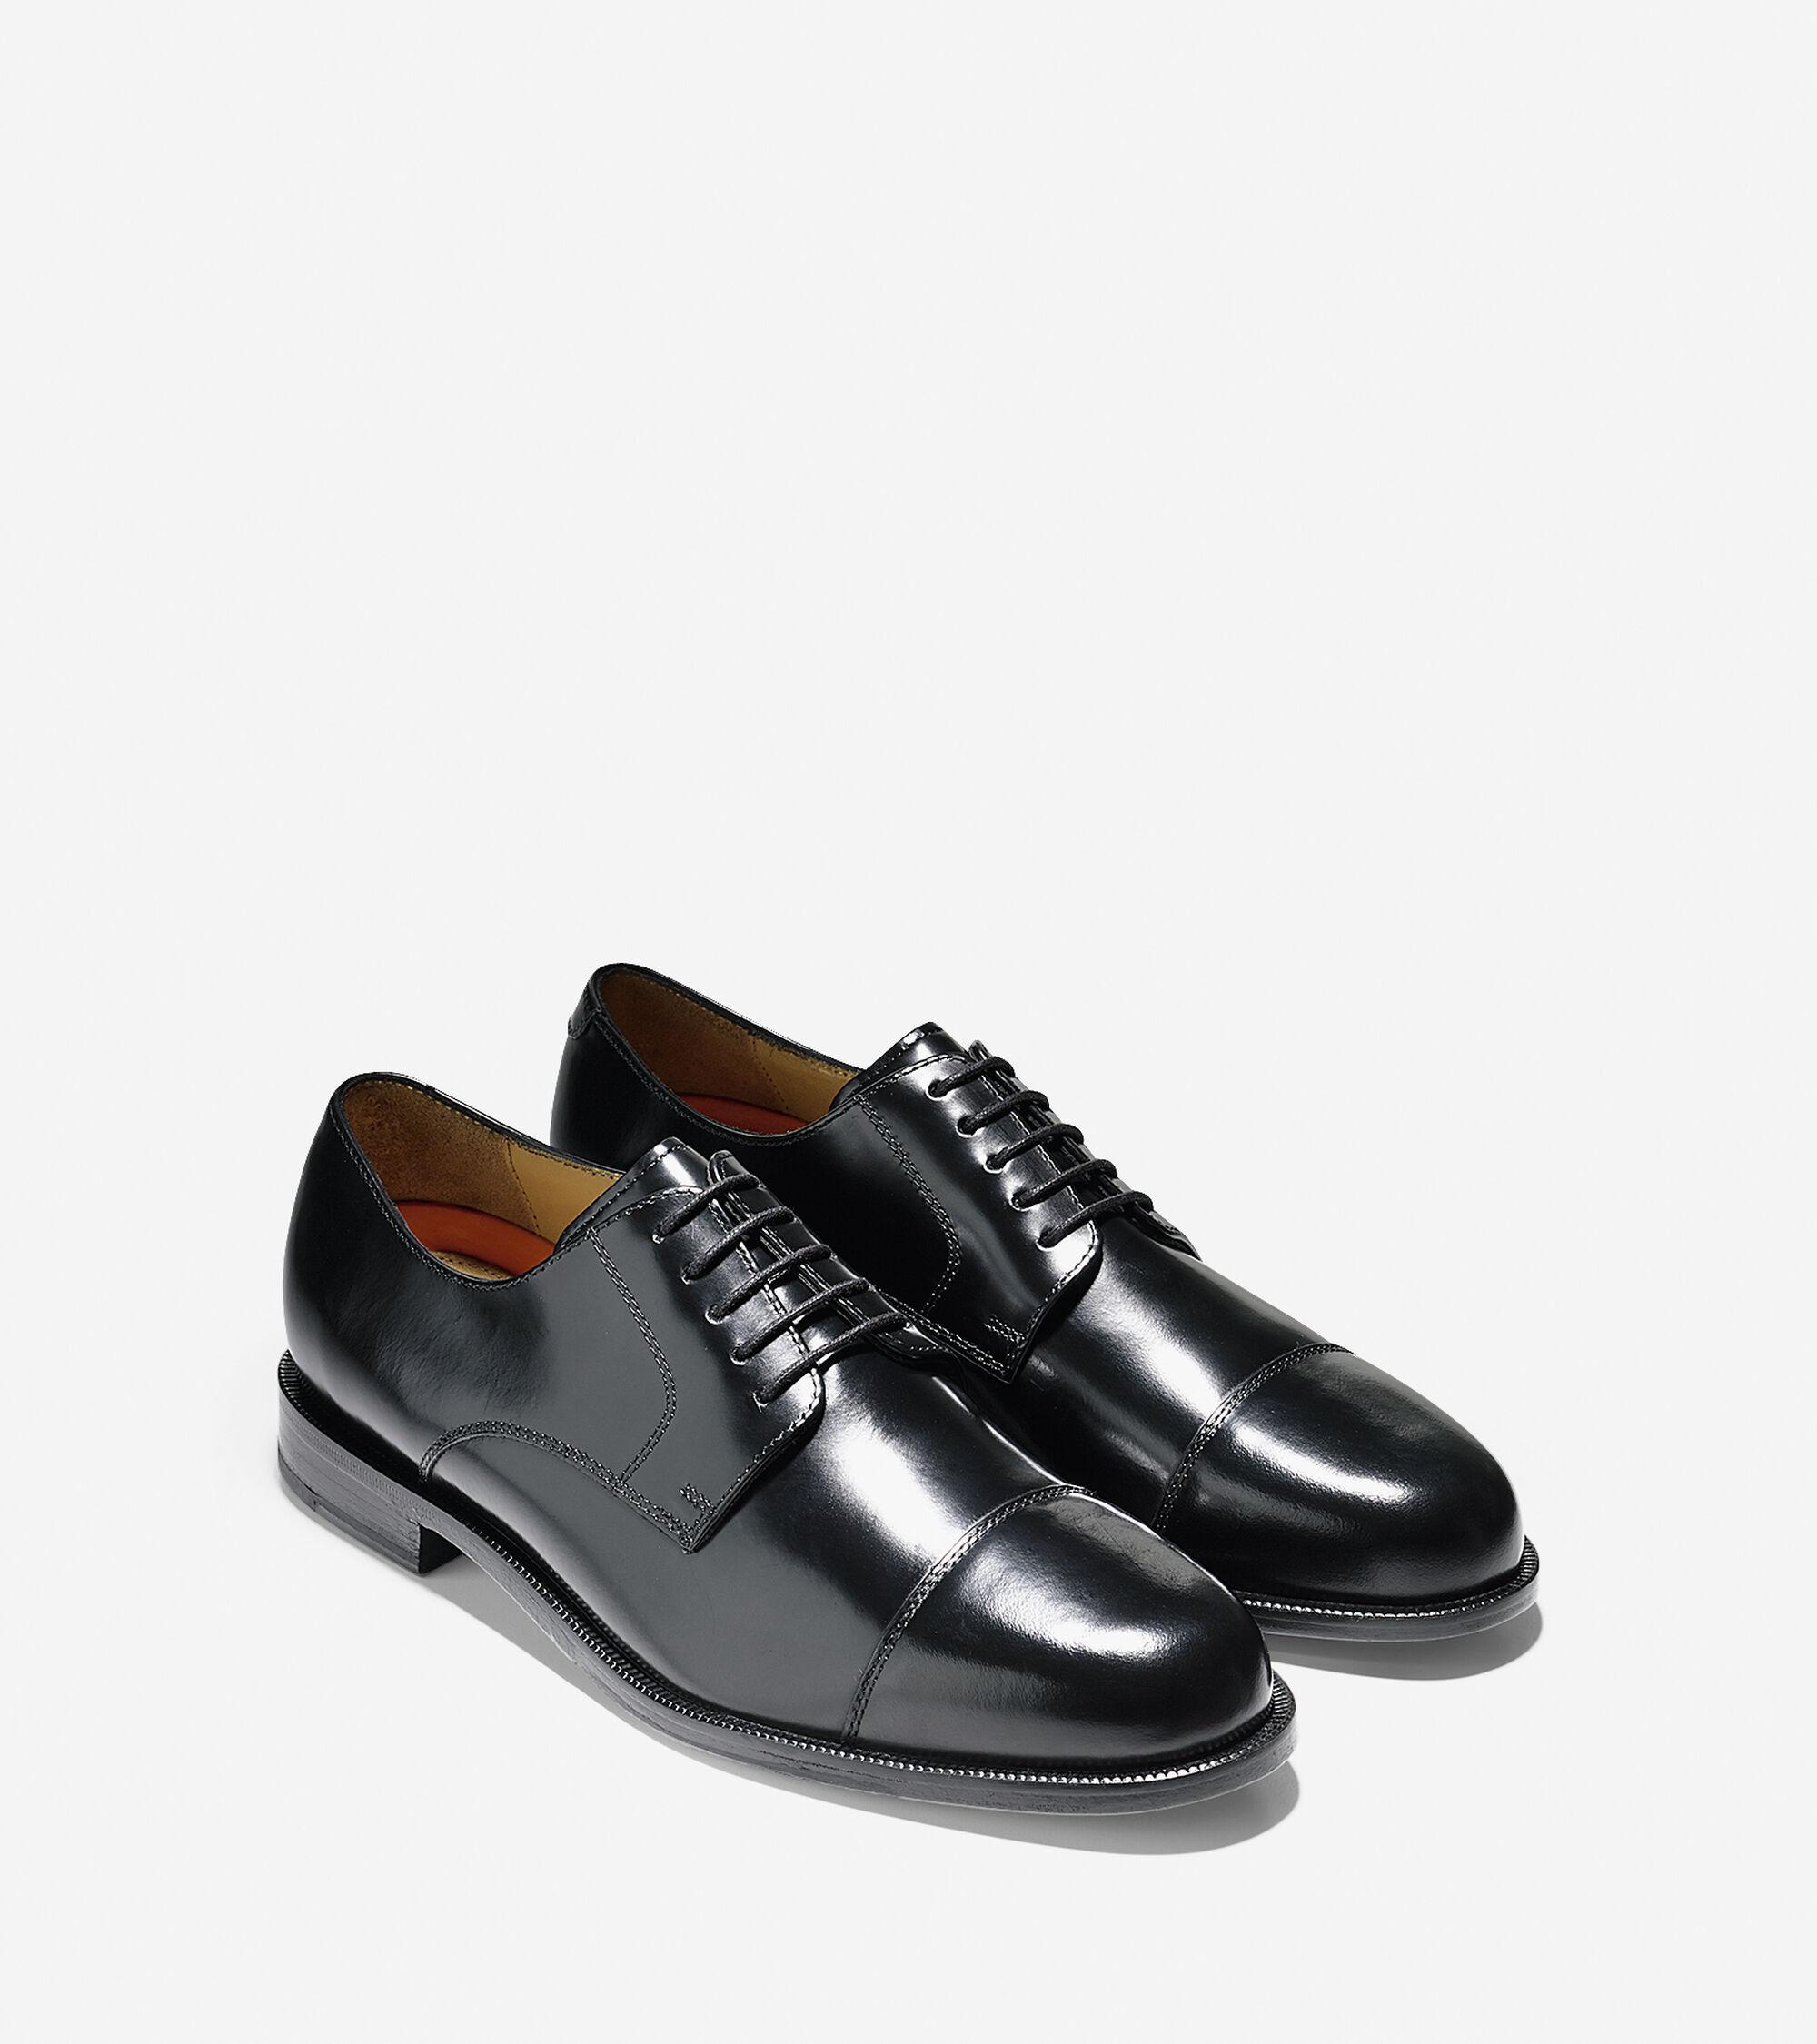 91e40510b46 Men s Carter Grand Cap Toe Oxfords in Black